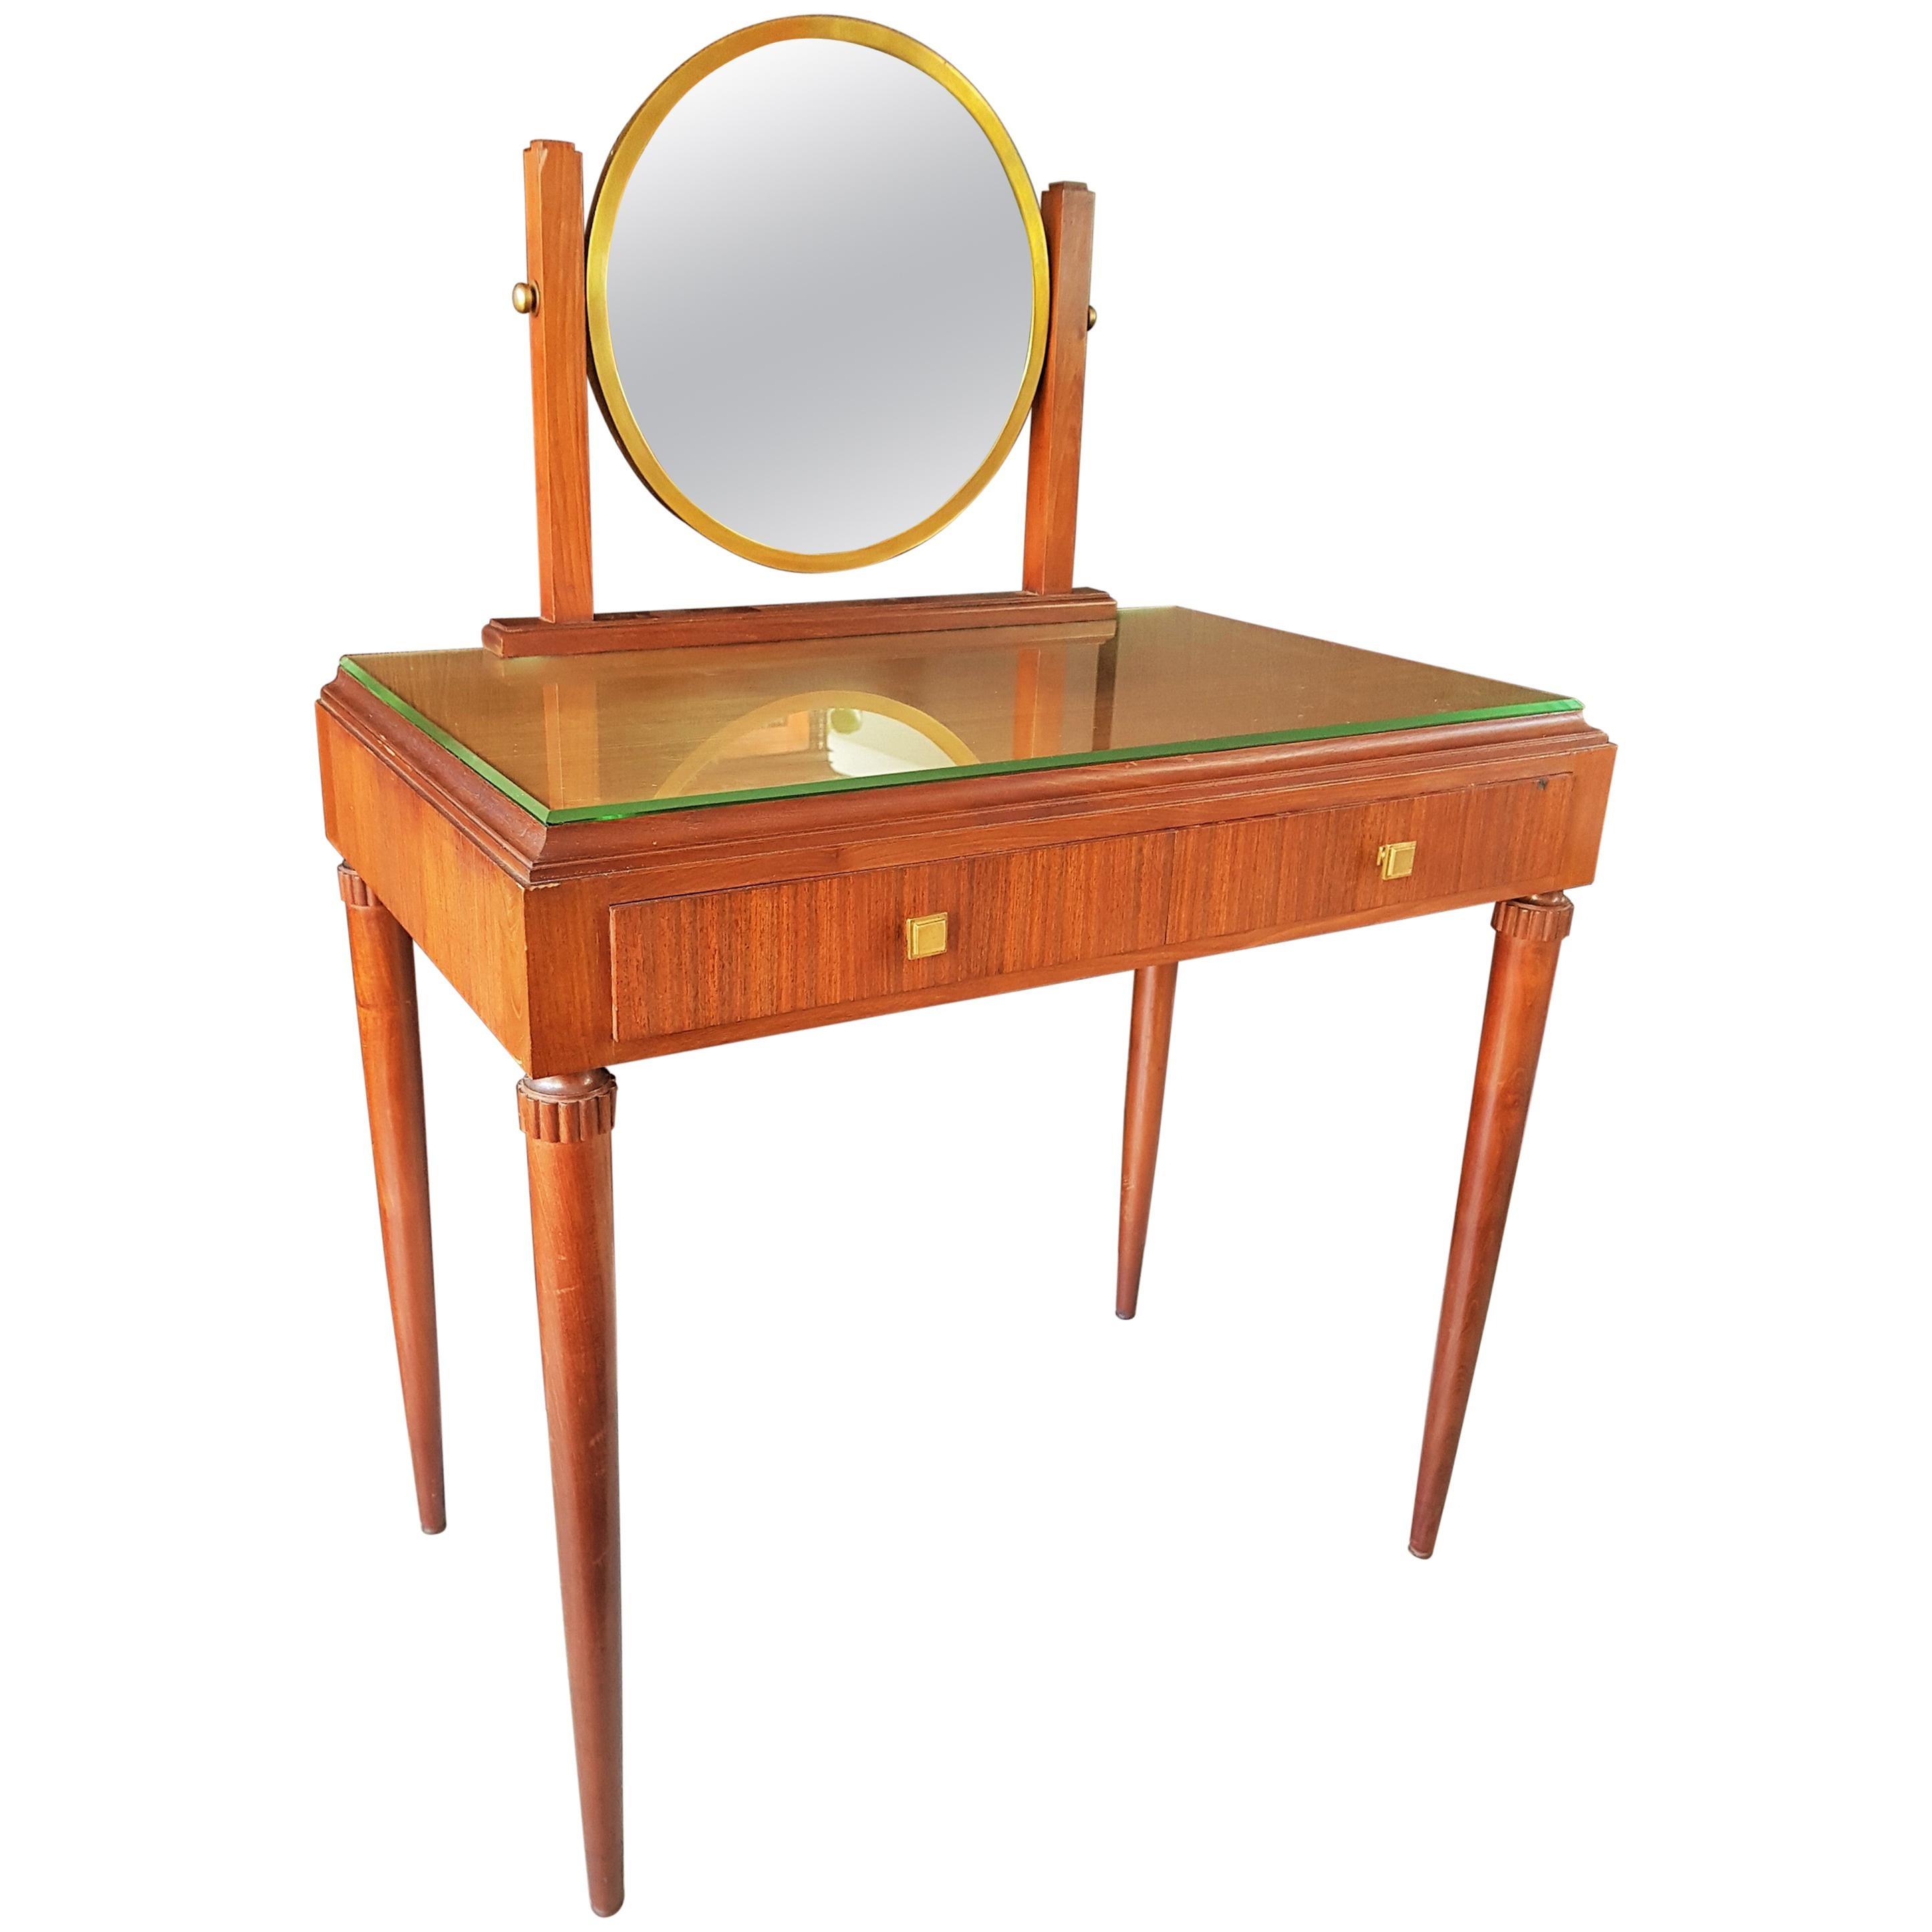 Art Deco Dresser Vanity Desk Signed by Majorelle, France, 1938